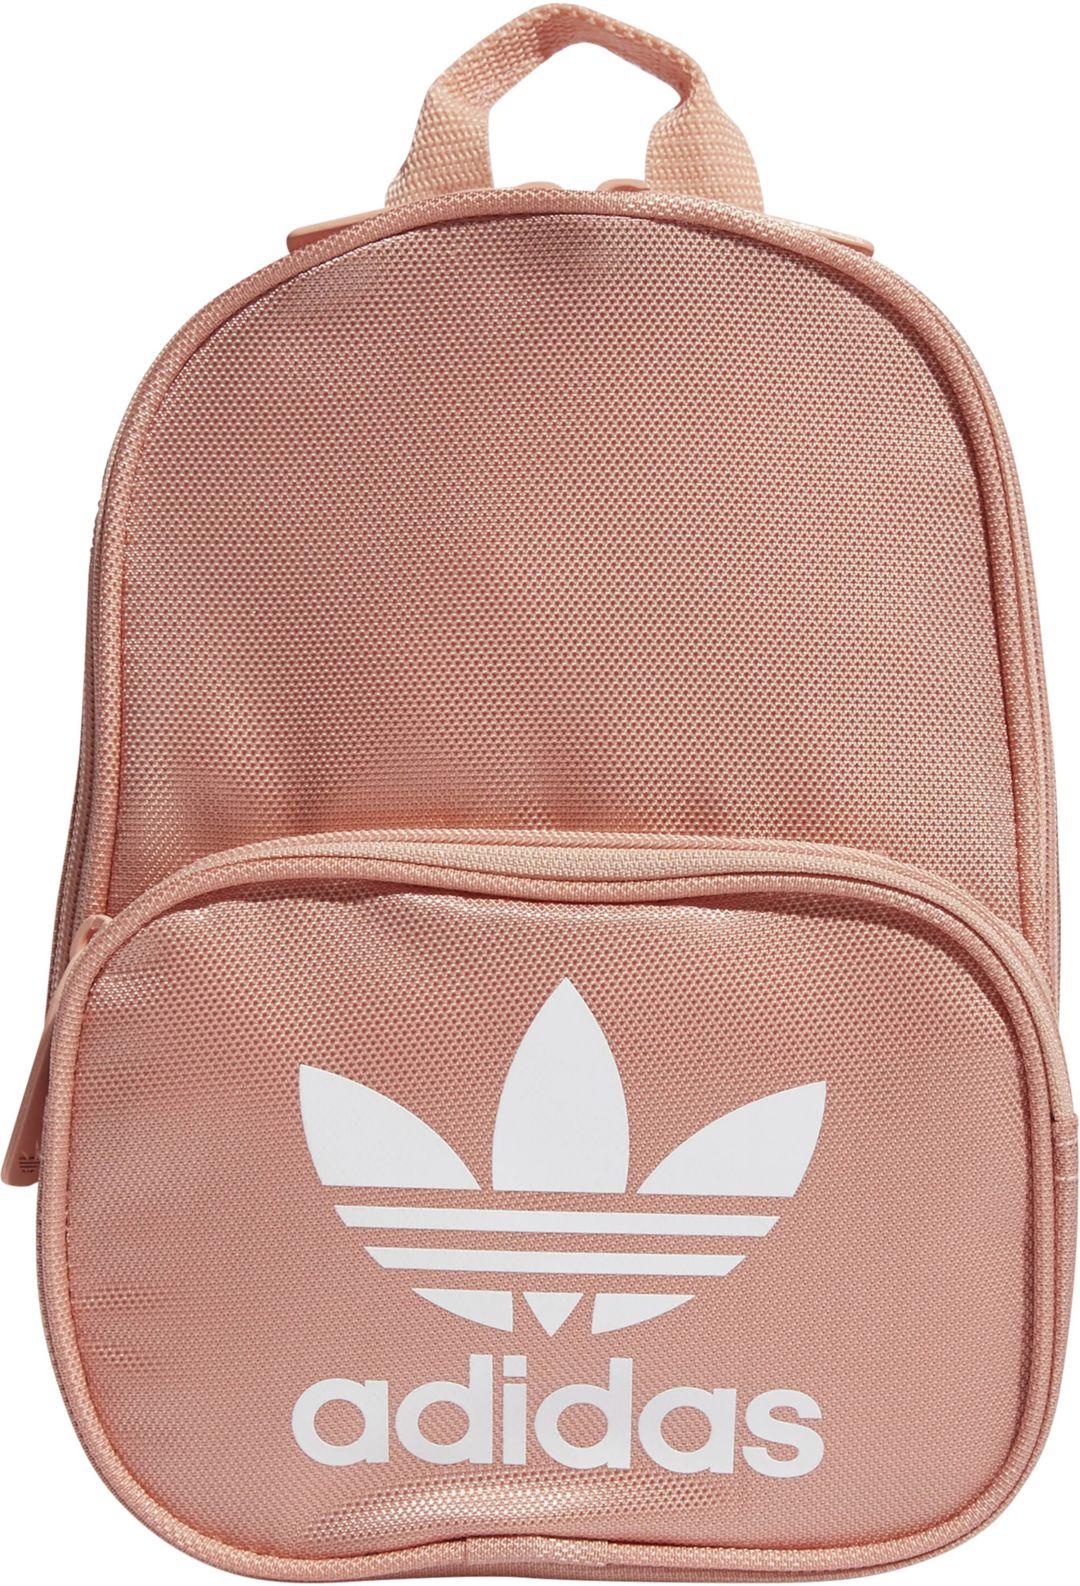 d5c4ce1012e8 adidas Originals Women's Santiago Mini Backpack